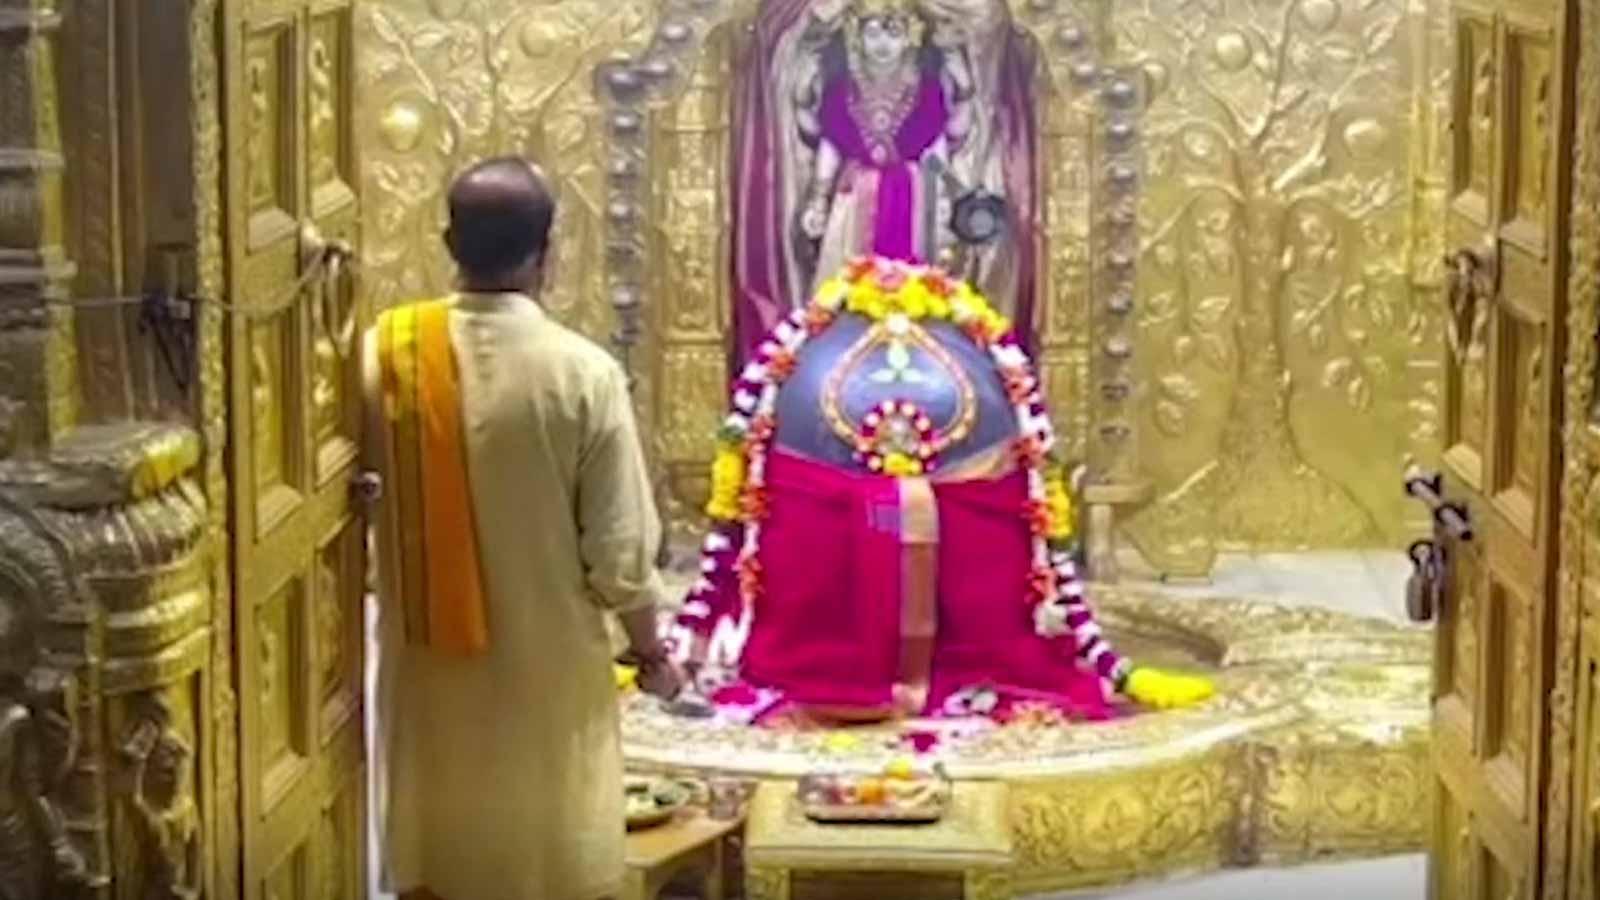 darshan-at-shree-somnath-temple-first-jyotirlinga-25-feb-2021